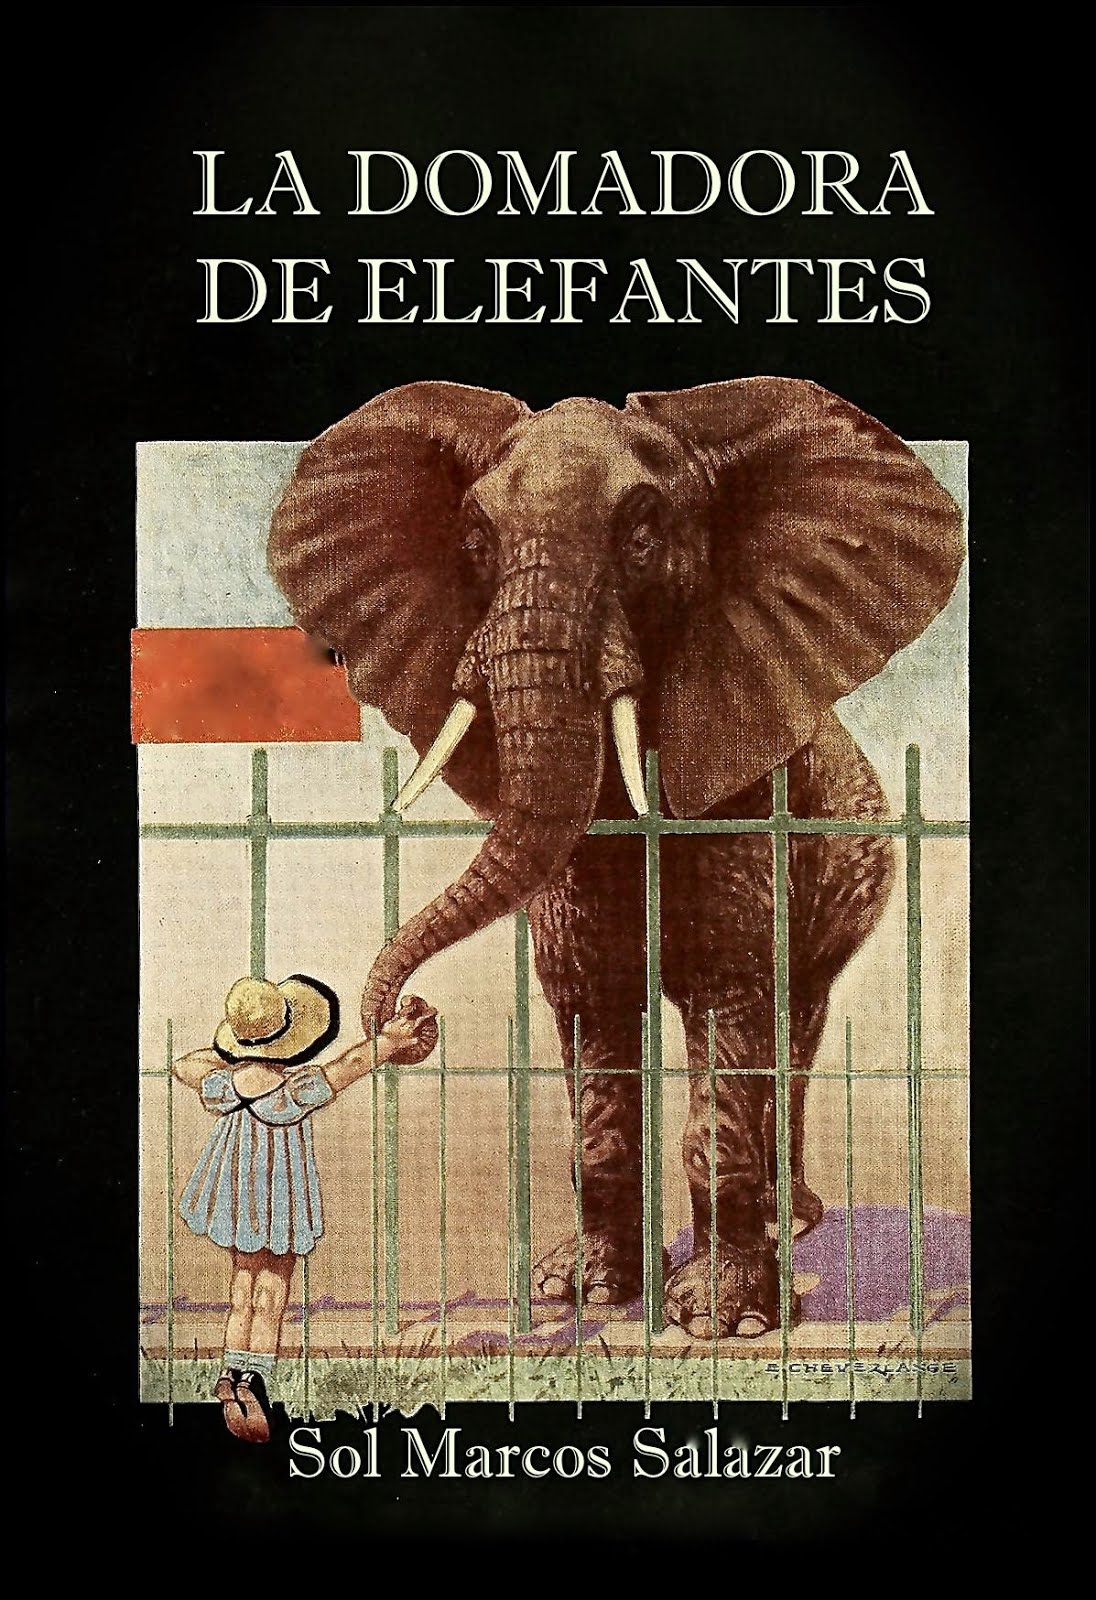 La domadora de elefantes en amazon